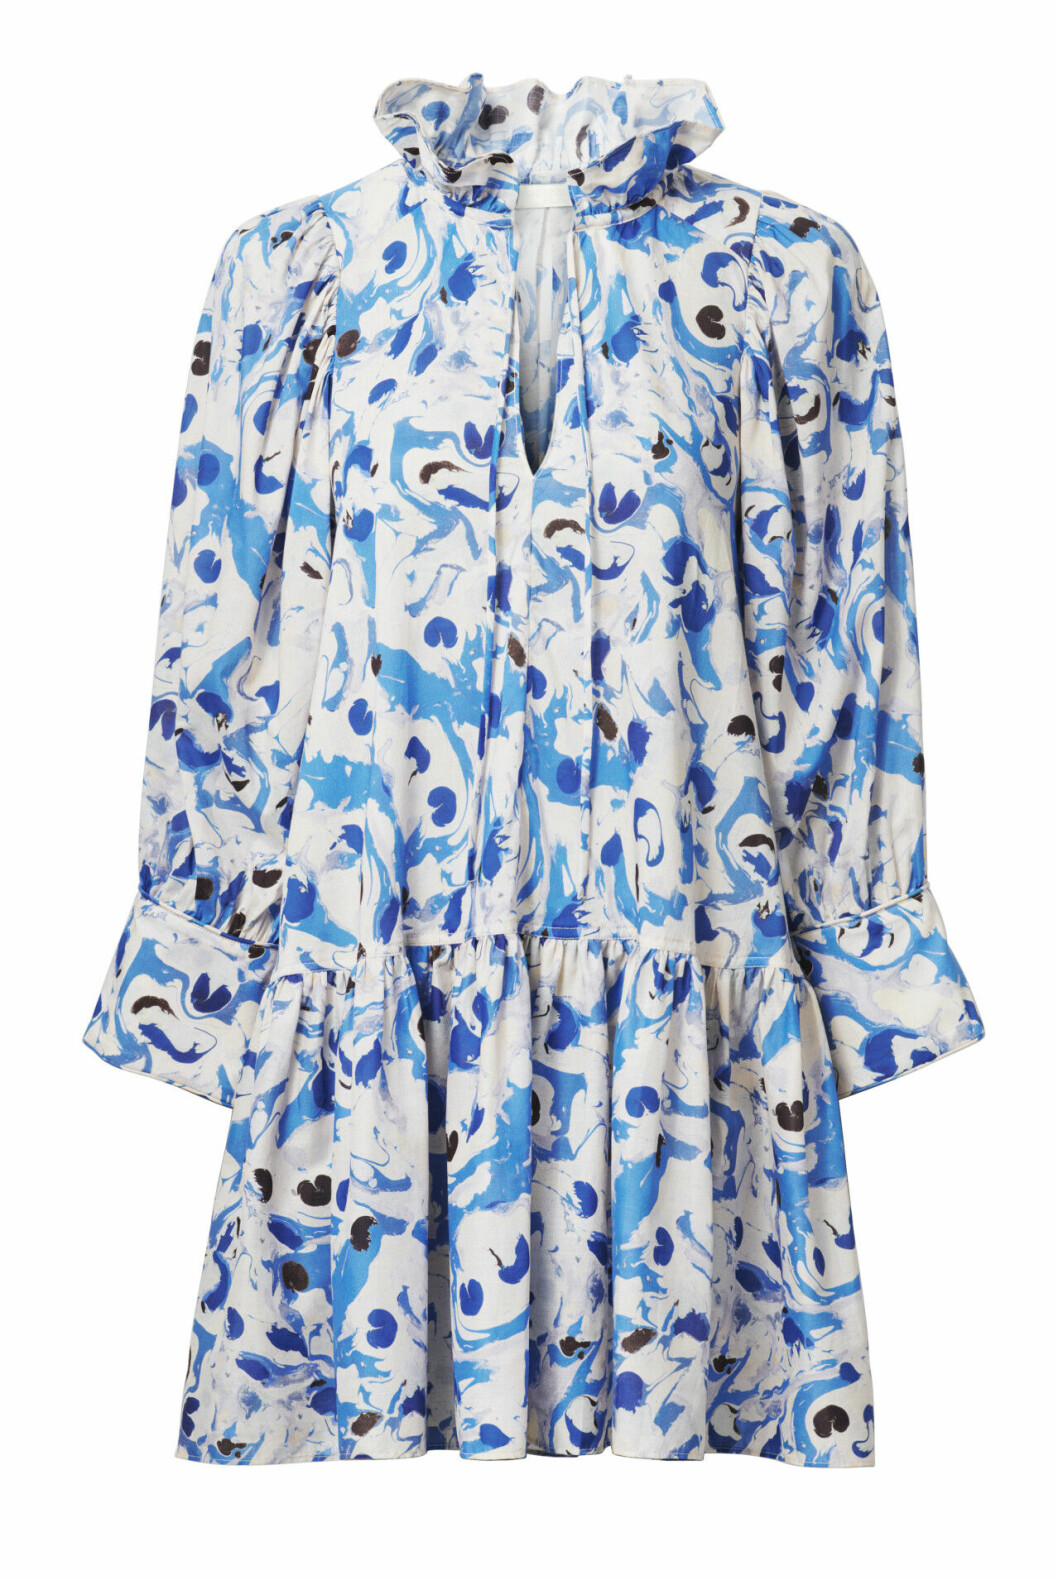 H&M conscious exclusive SS20 – blåvit tunika